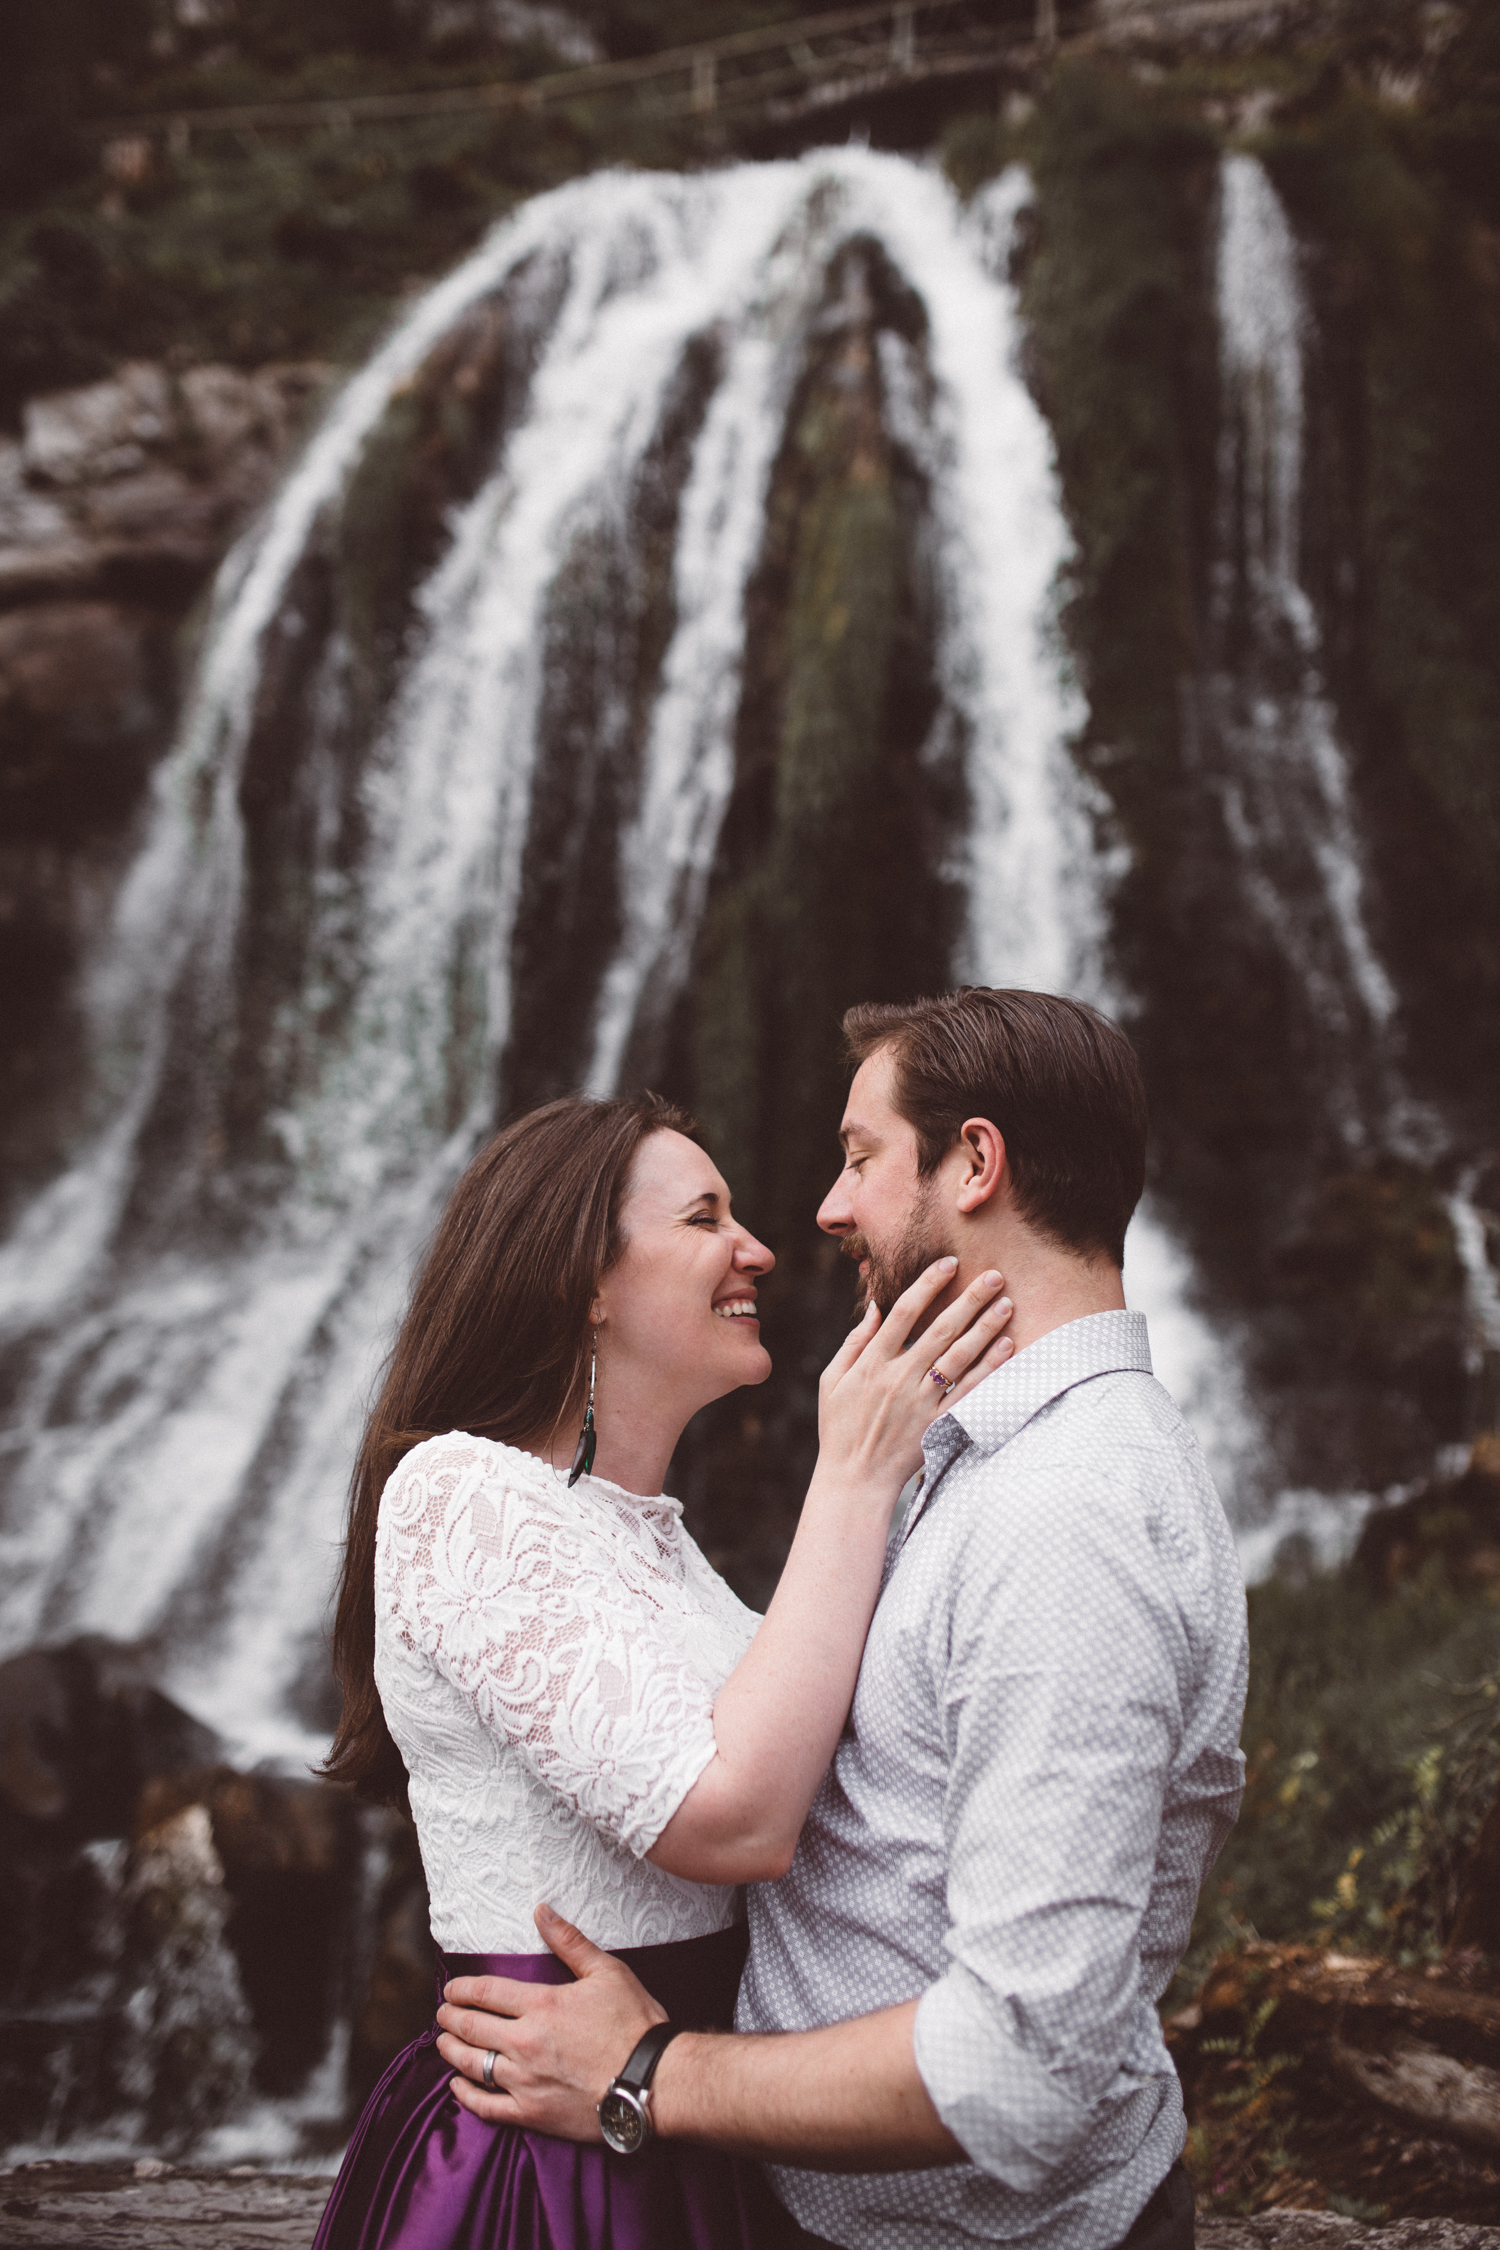 kdp_courtney&sean_wed_web-78.jpg